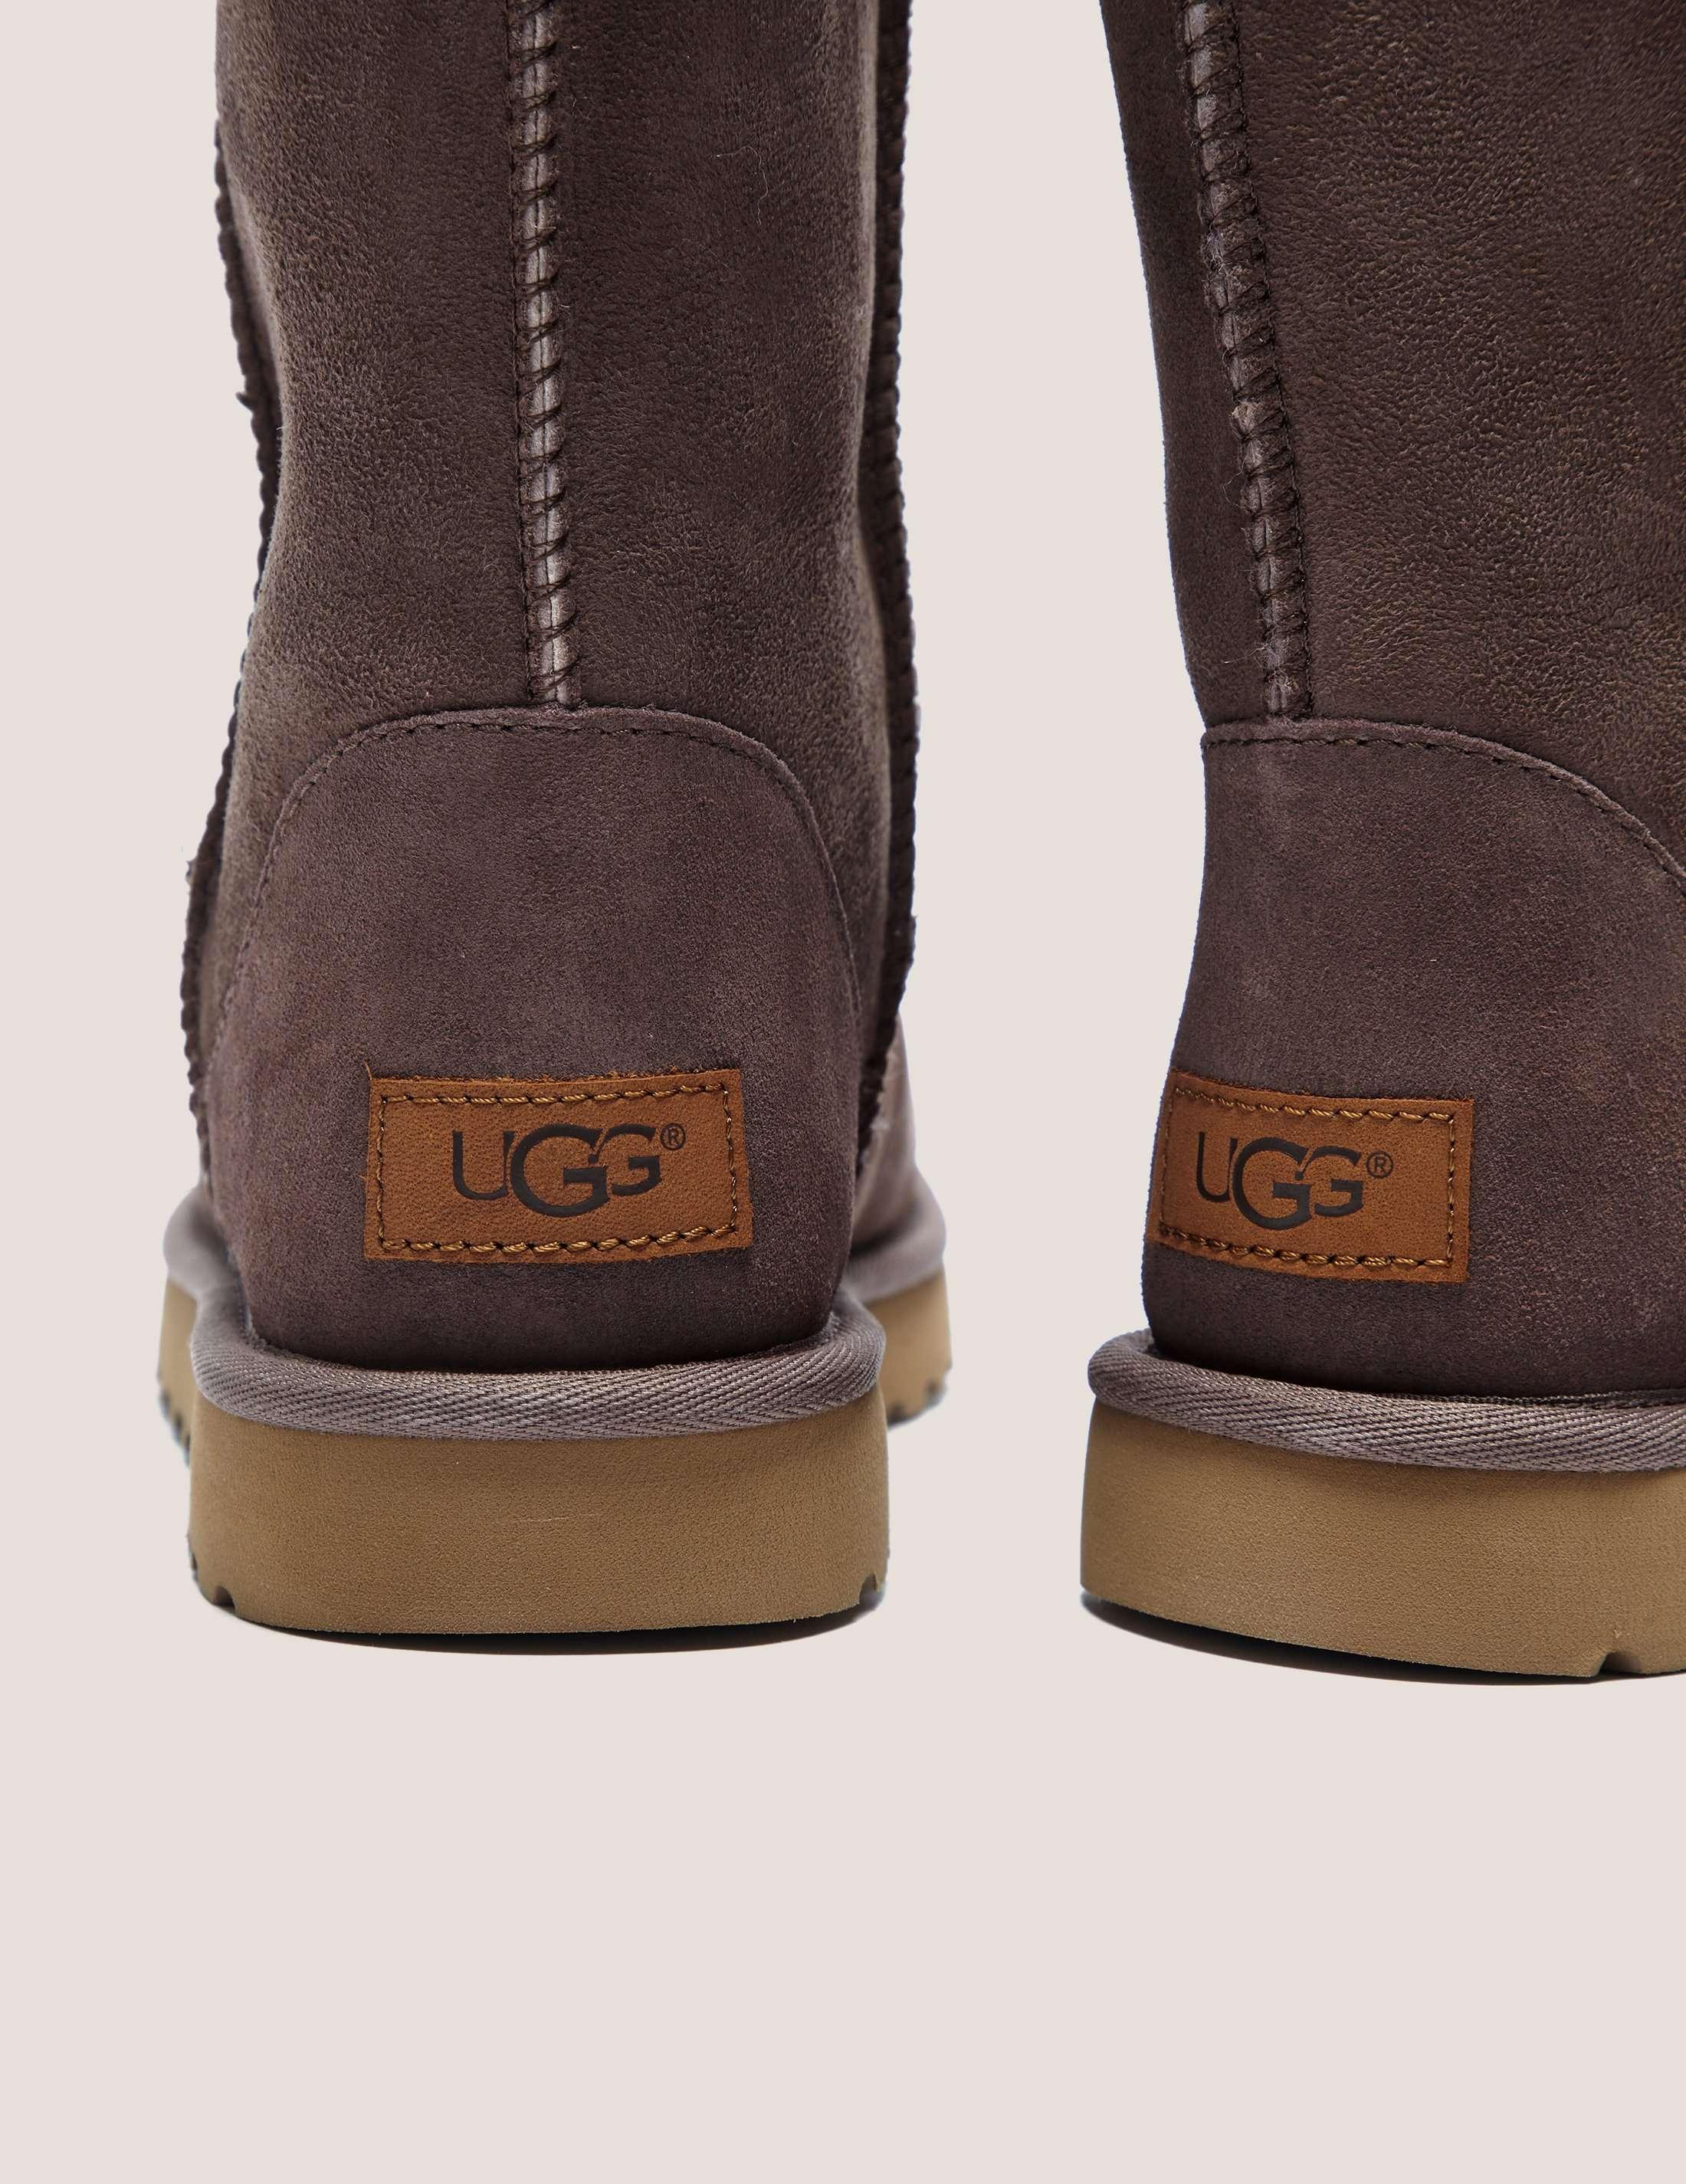 UGG Classic Short 2 Boot